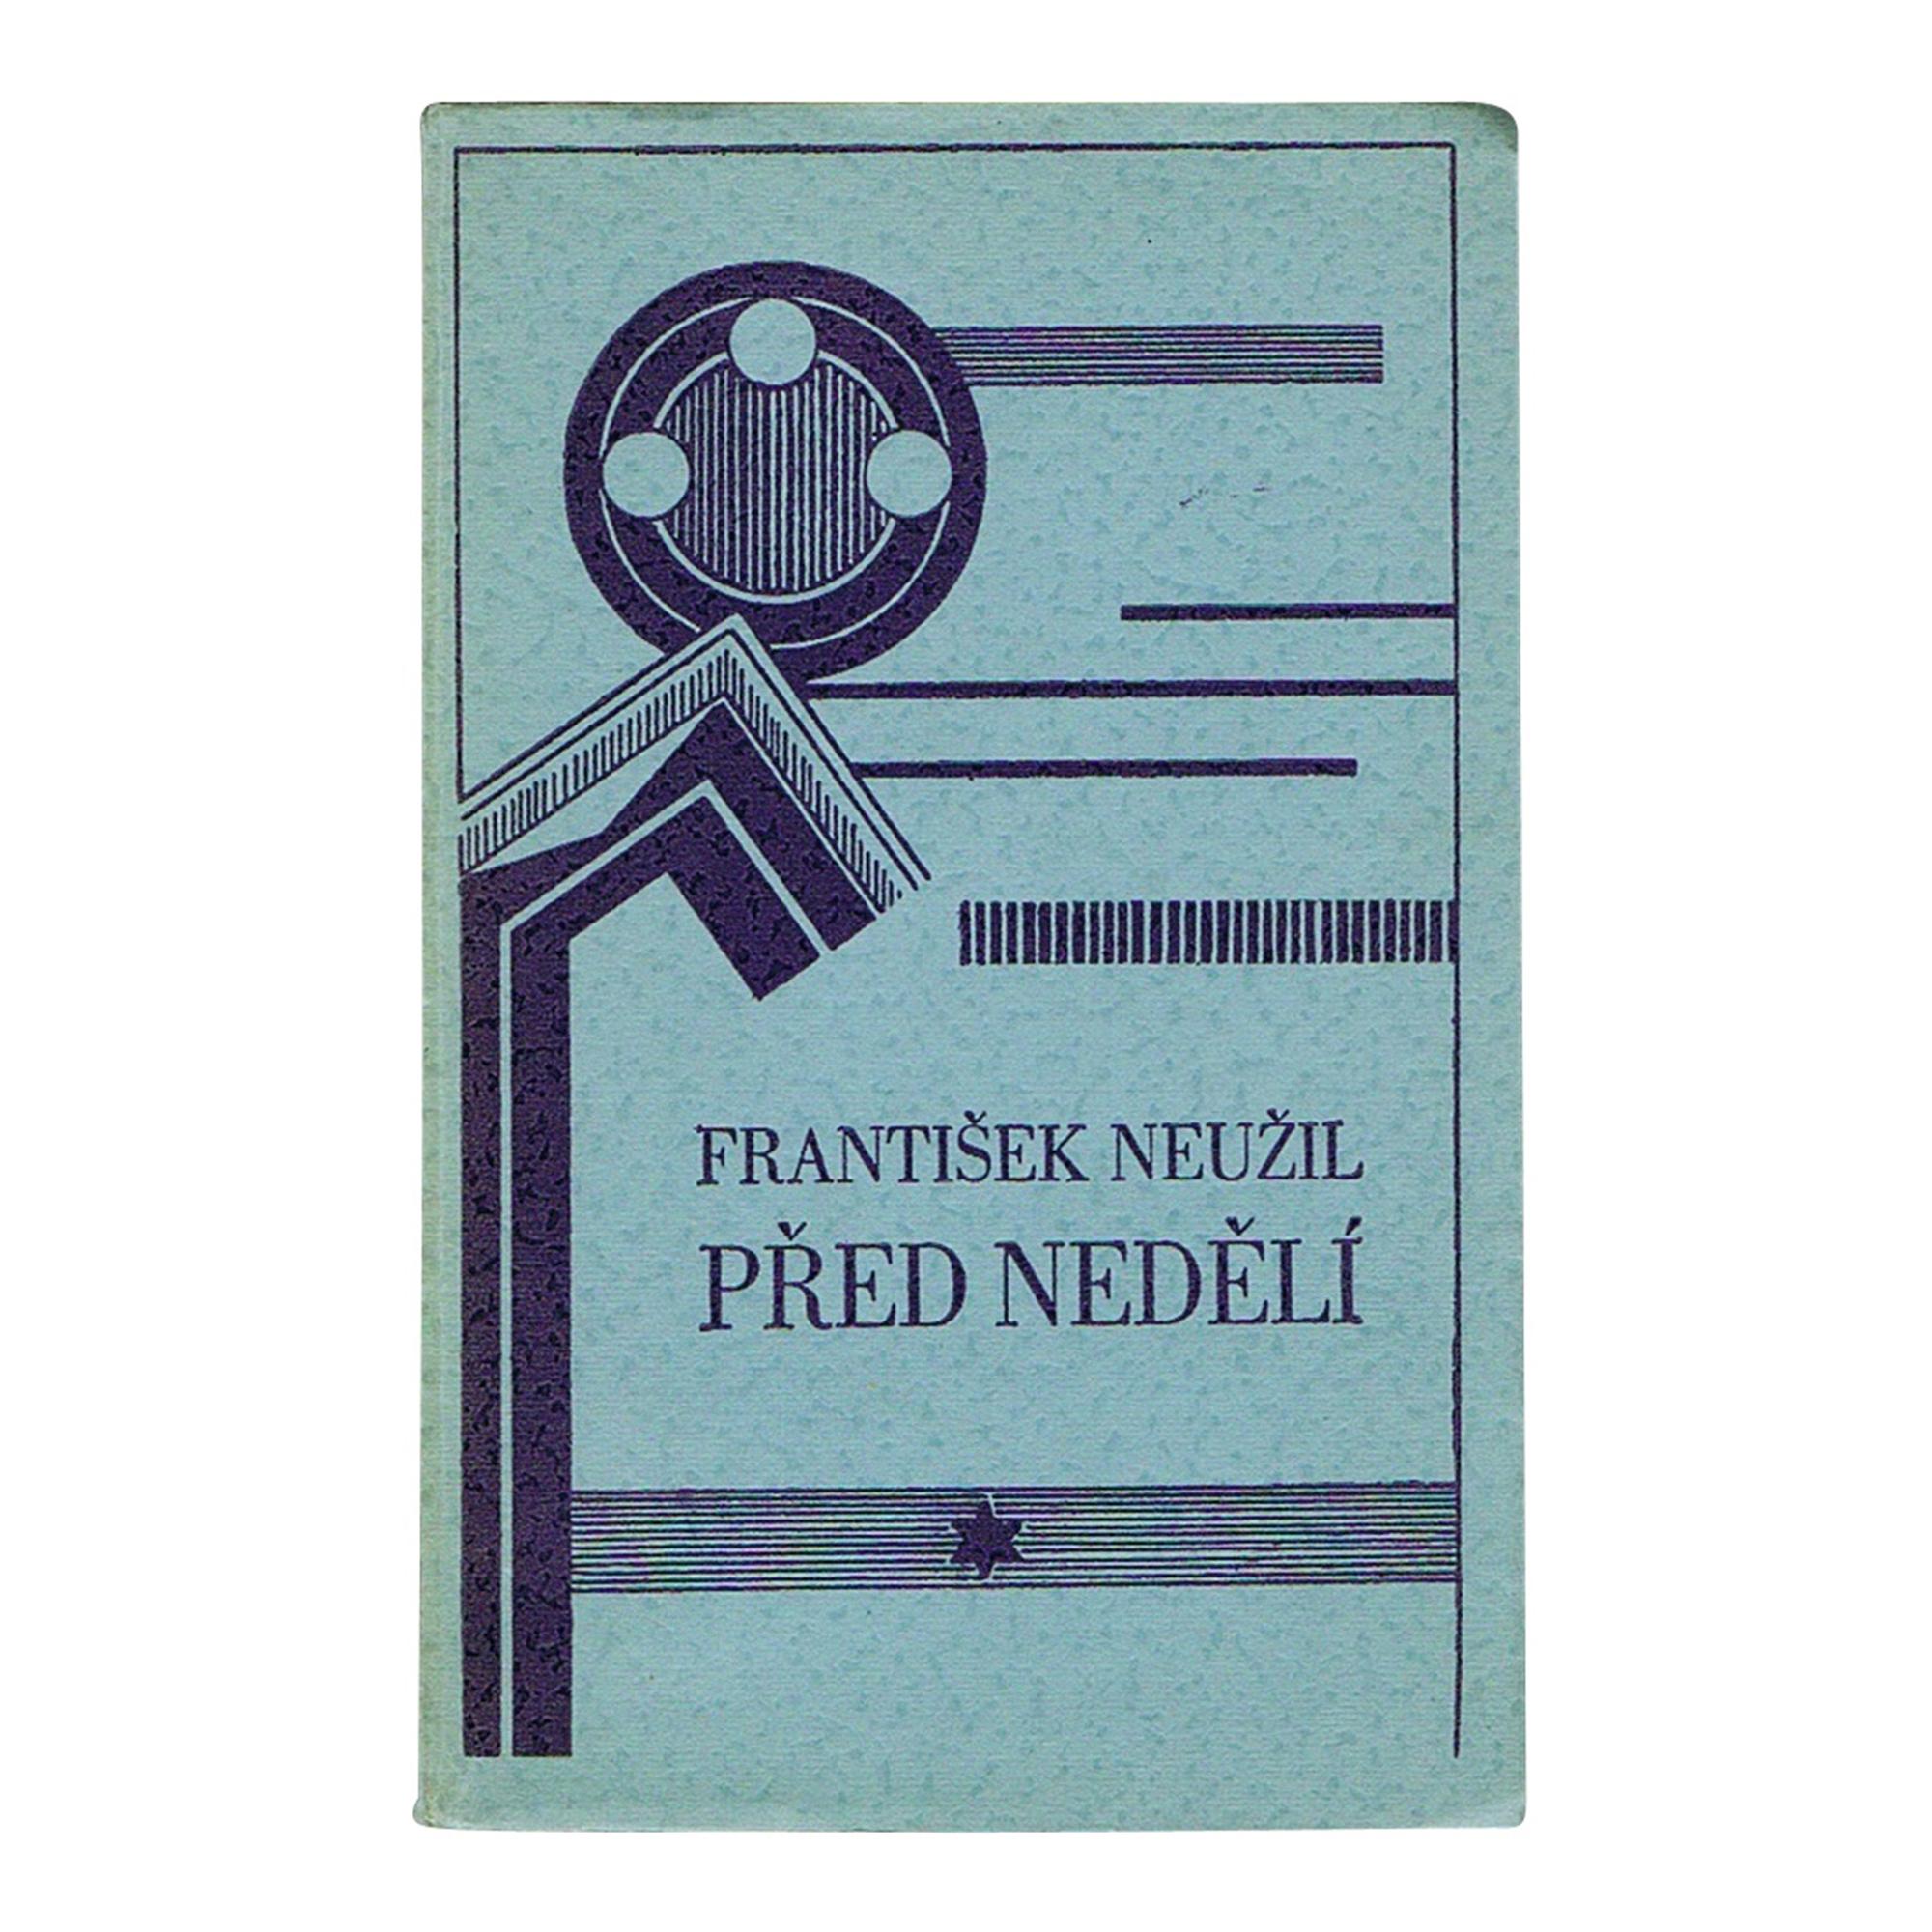 23-1372-Neuzil-Bechny-Nedjeli-1928-1.jpg